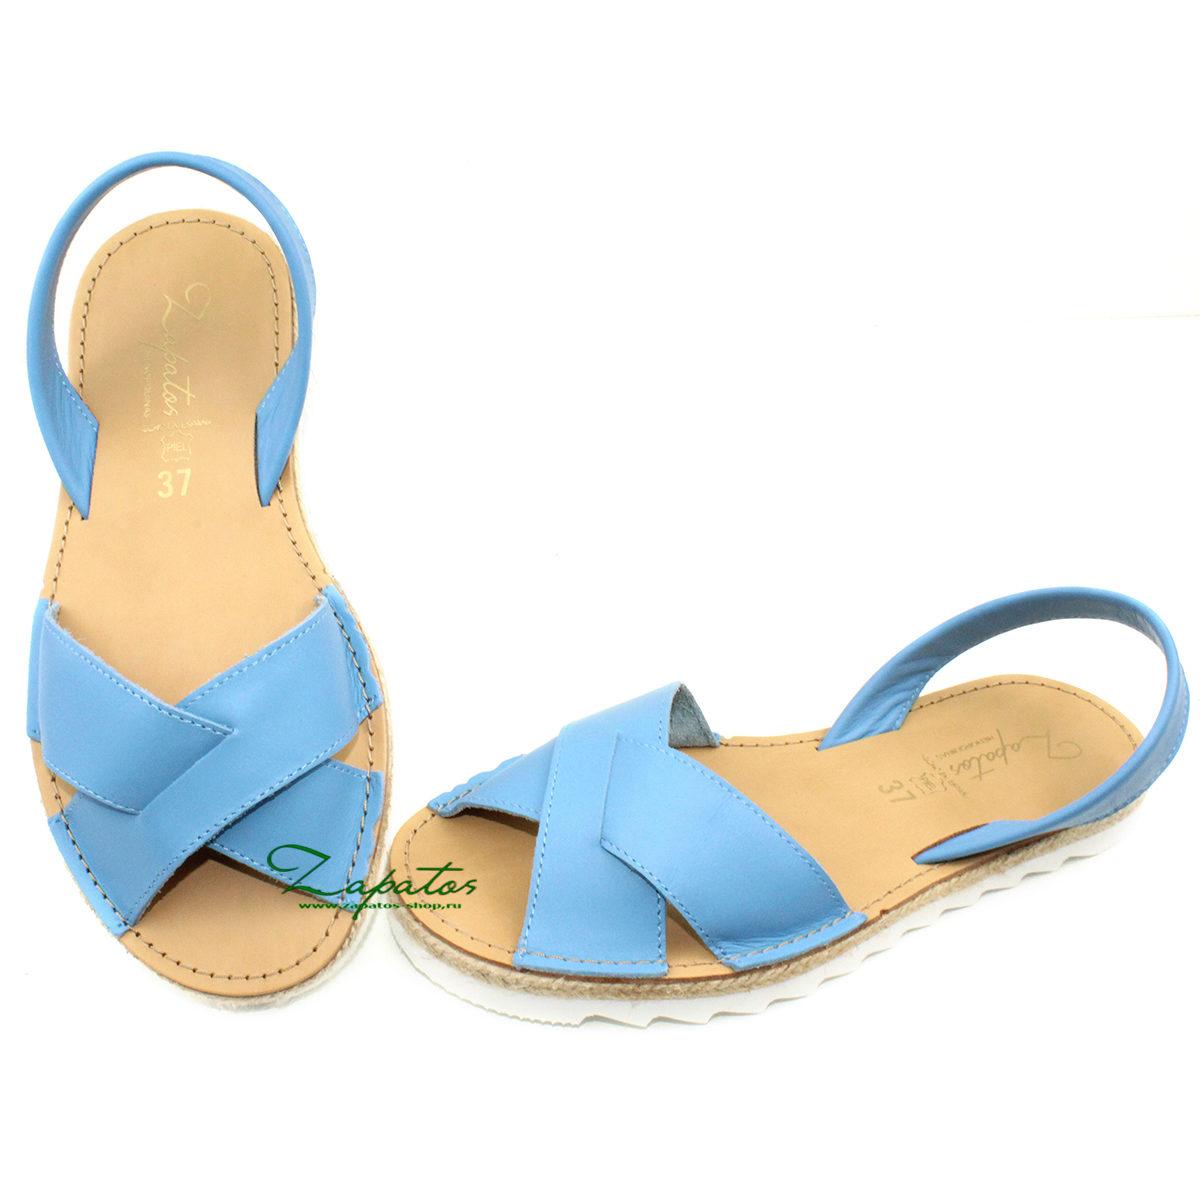 Абаркасы Zapatos Cruz-Yute celeste